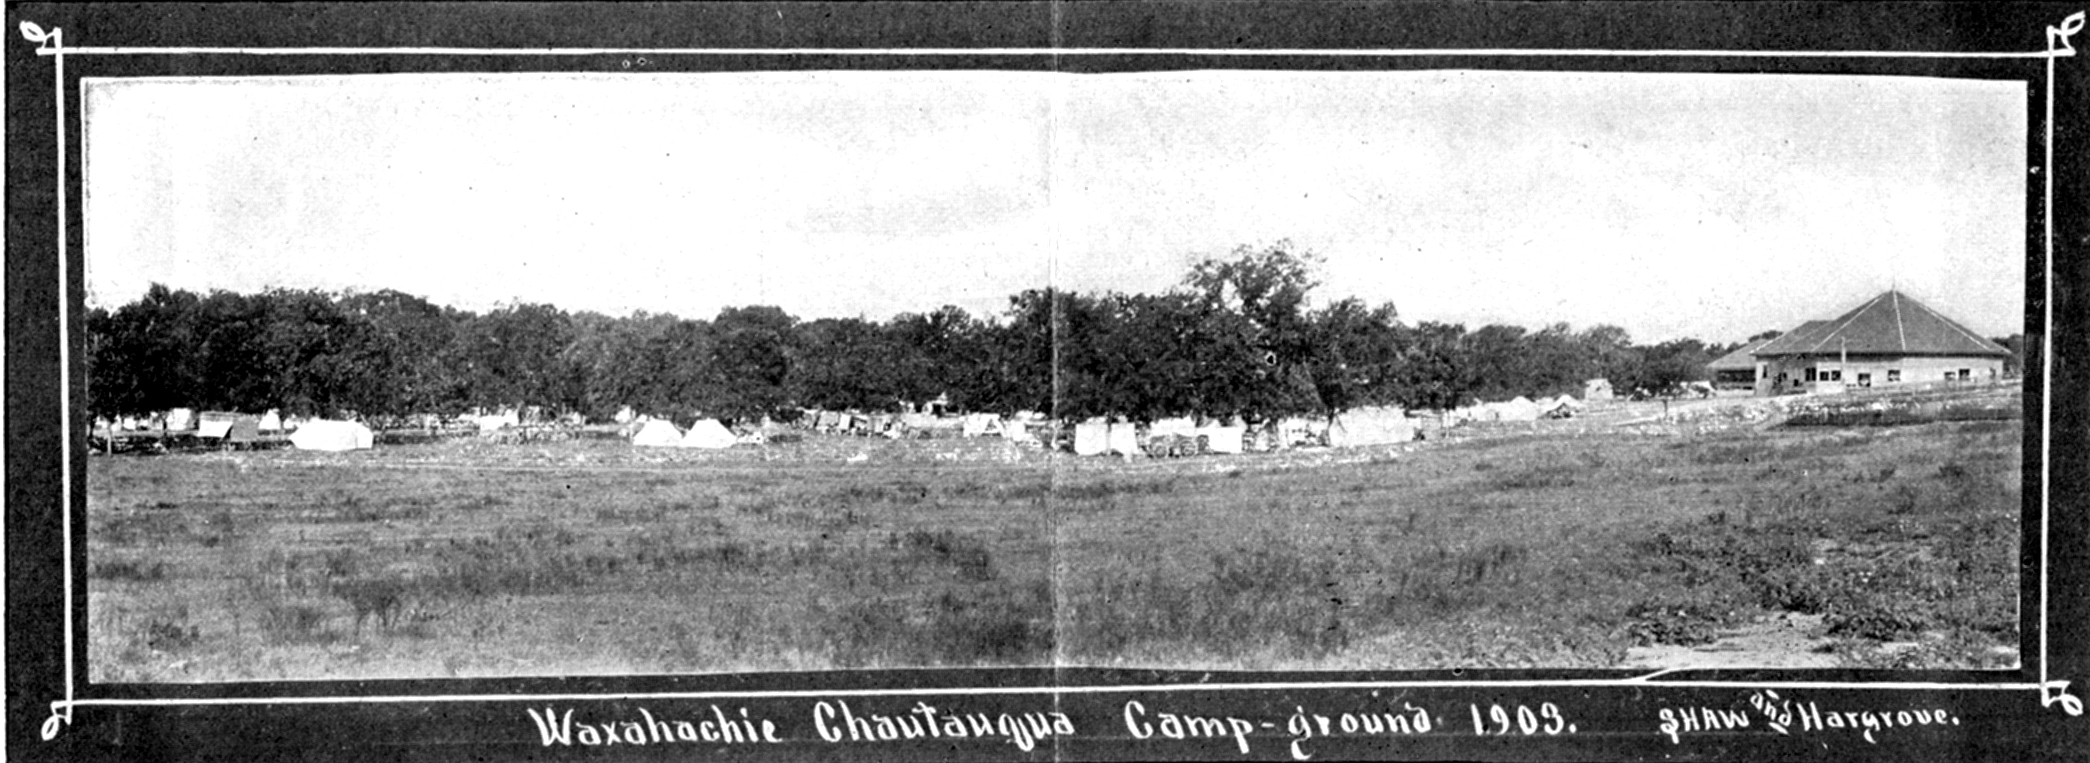 20_Panorama Campgrounds & Chaut.jpg